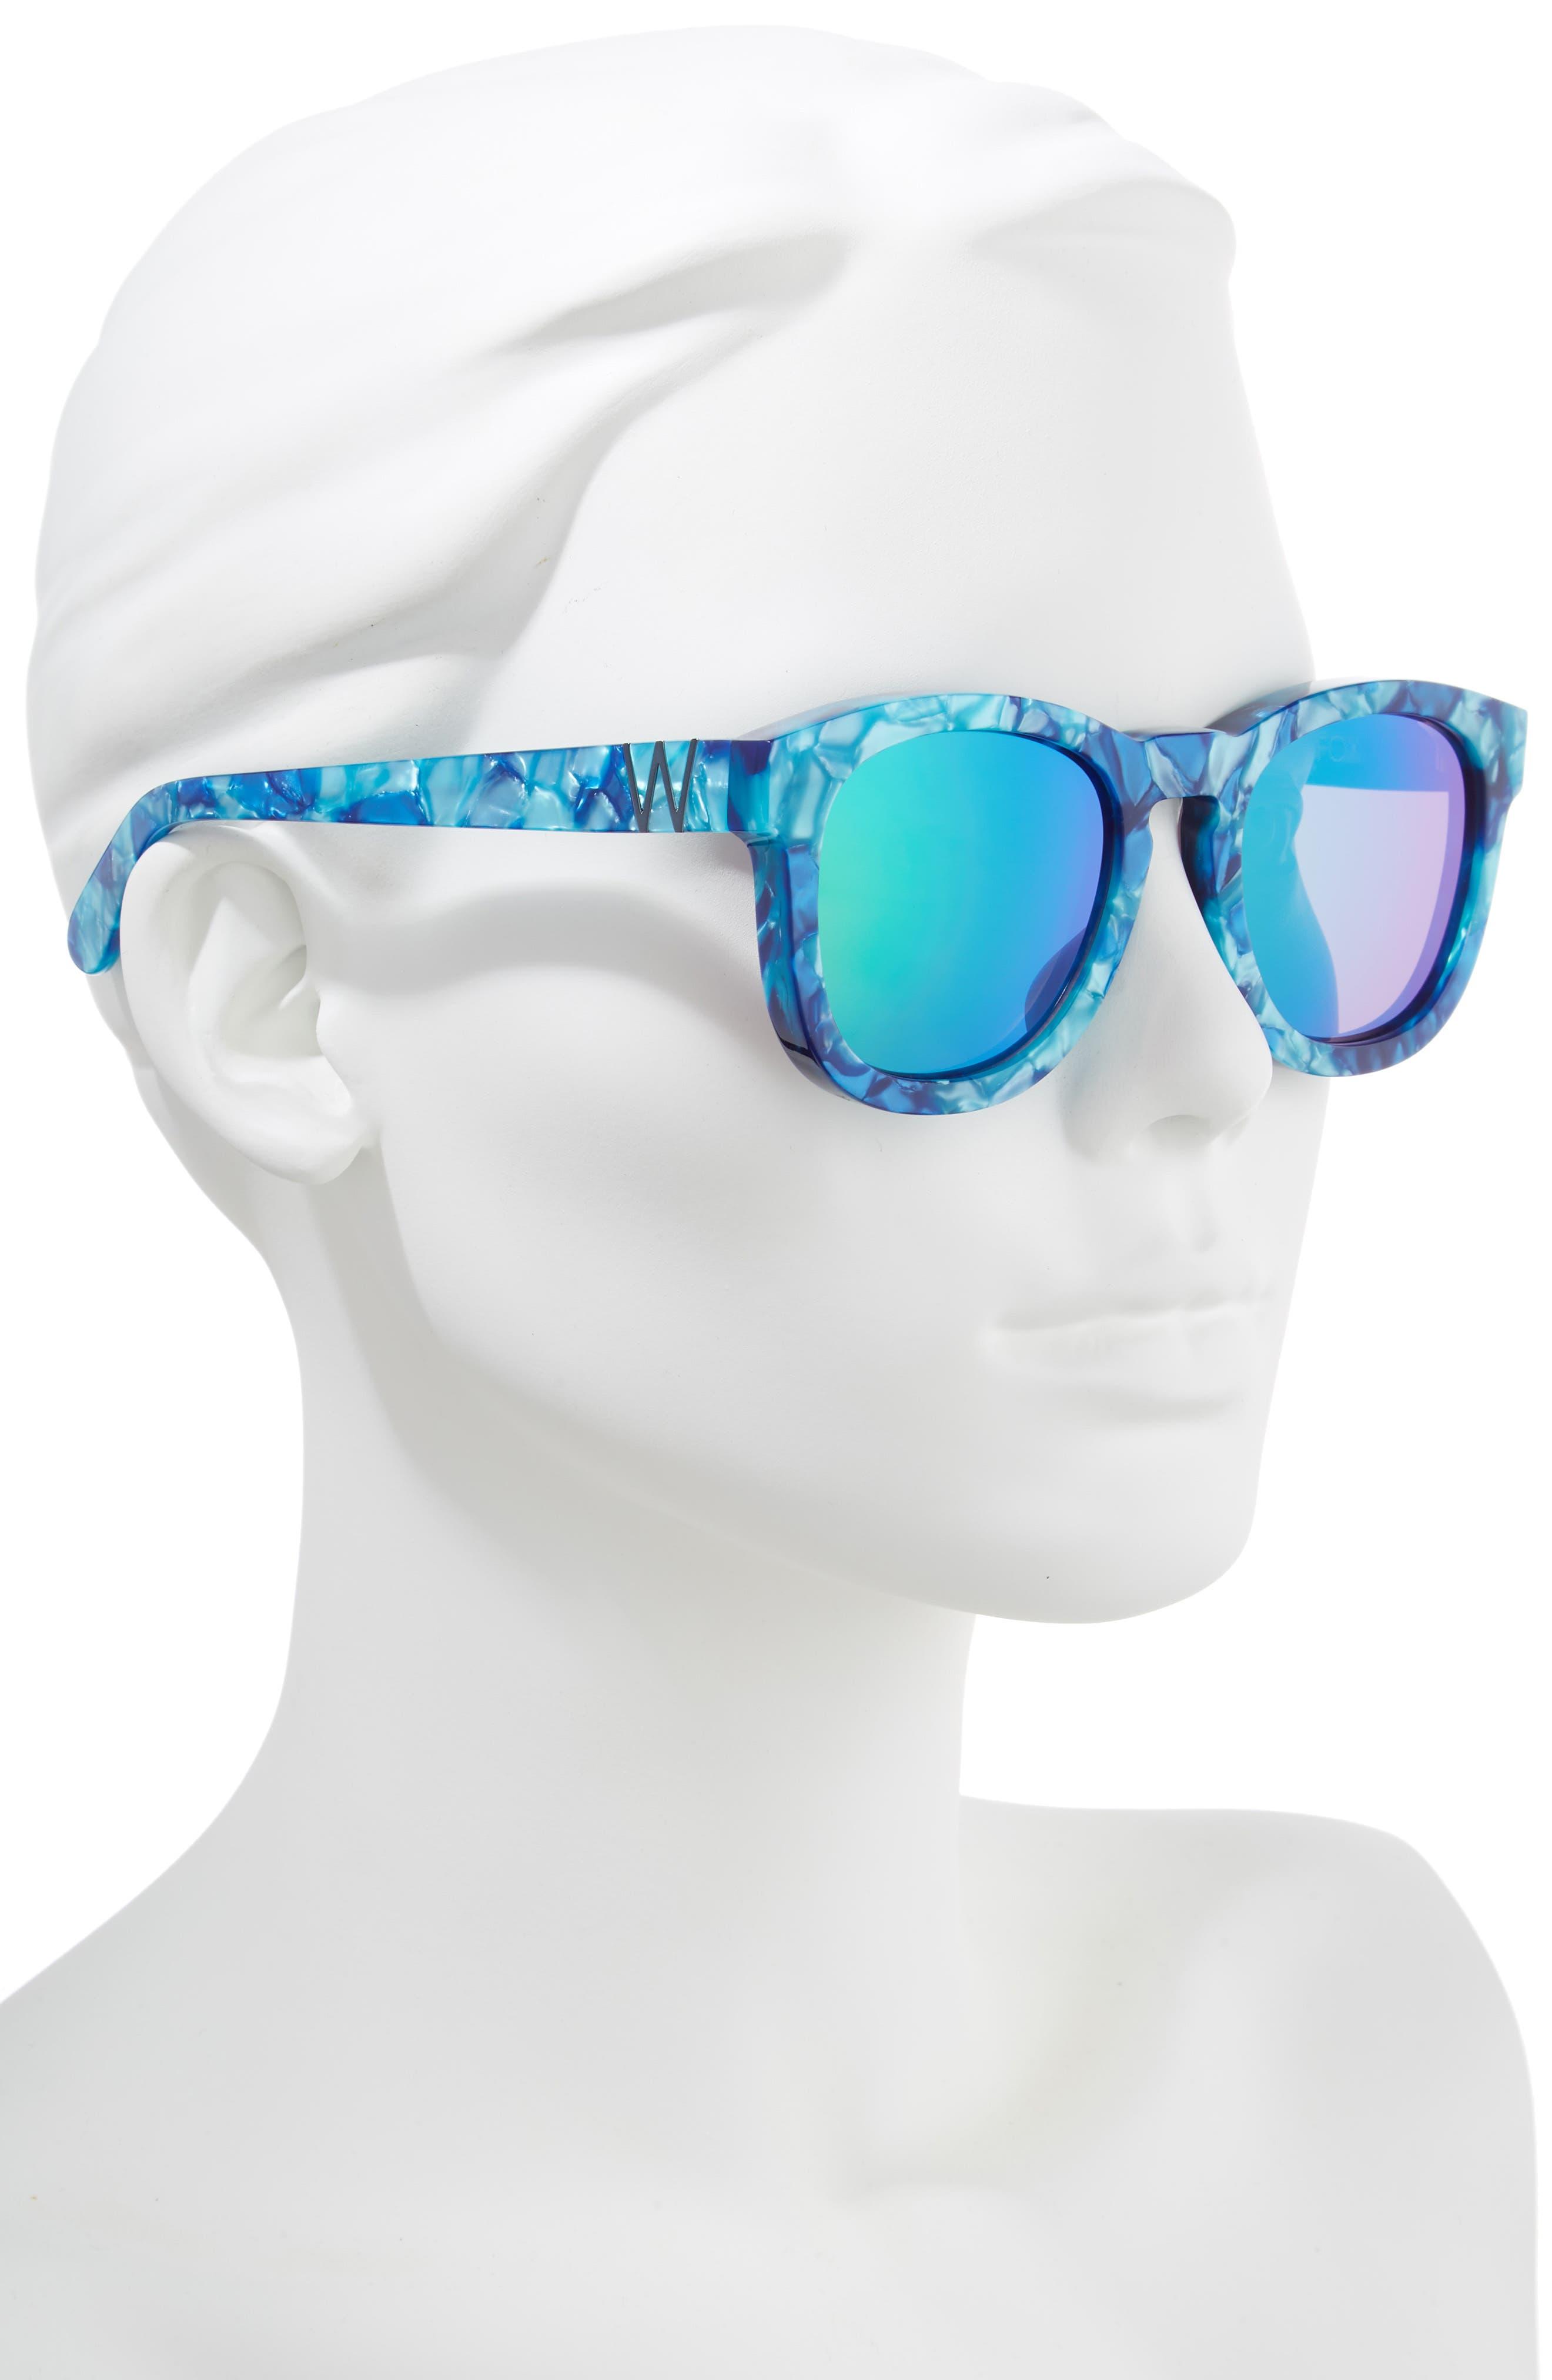 WILDFOX, Classic Fox - Deluxe 59mm Sunglasses, Alternate thumbnail 2, color, MONTEREY/ GREEN MIRROR